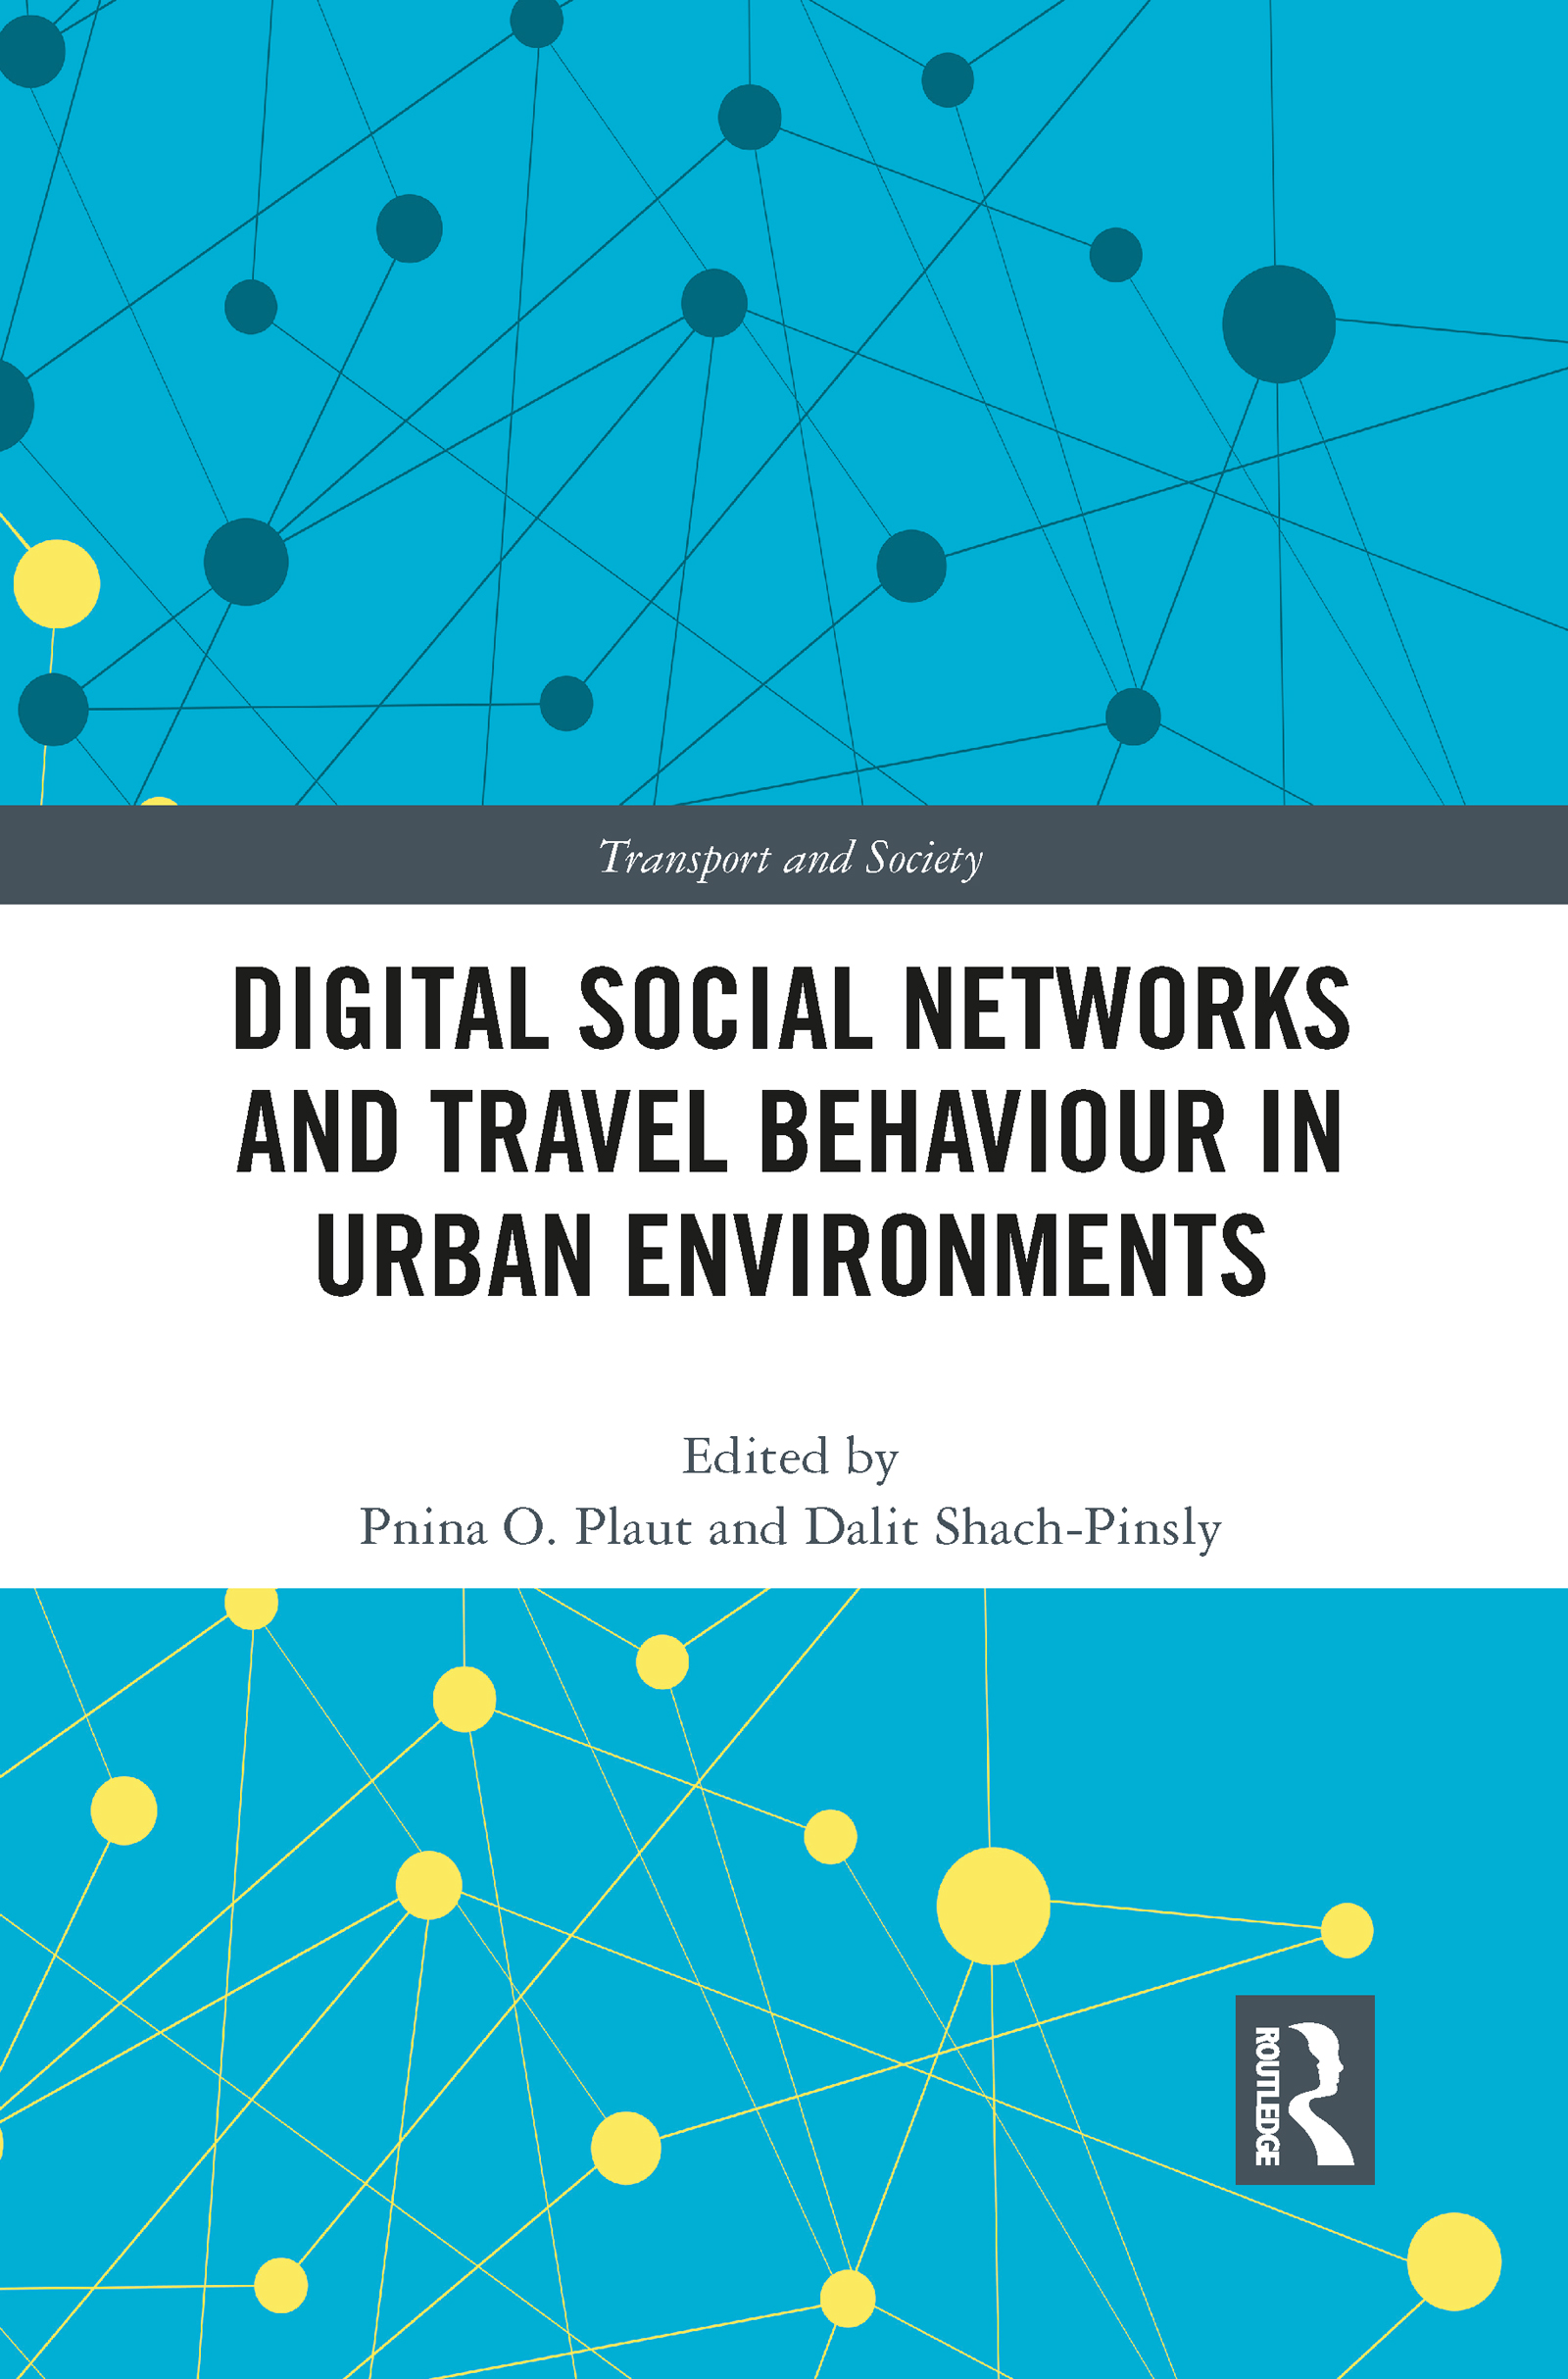 Digital Social Networks and Travel Behaviour in Urban Environments